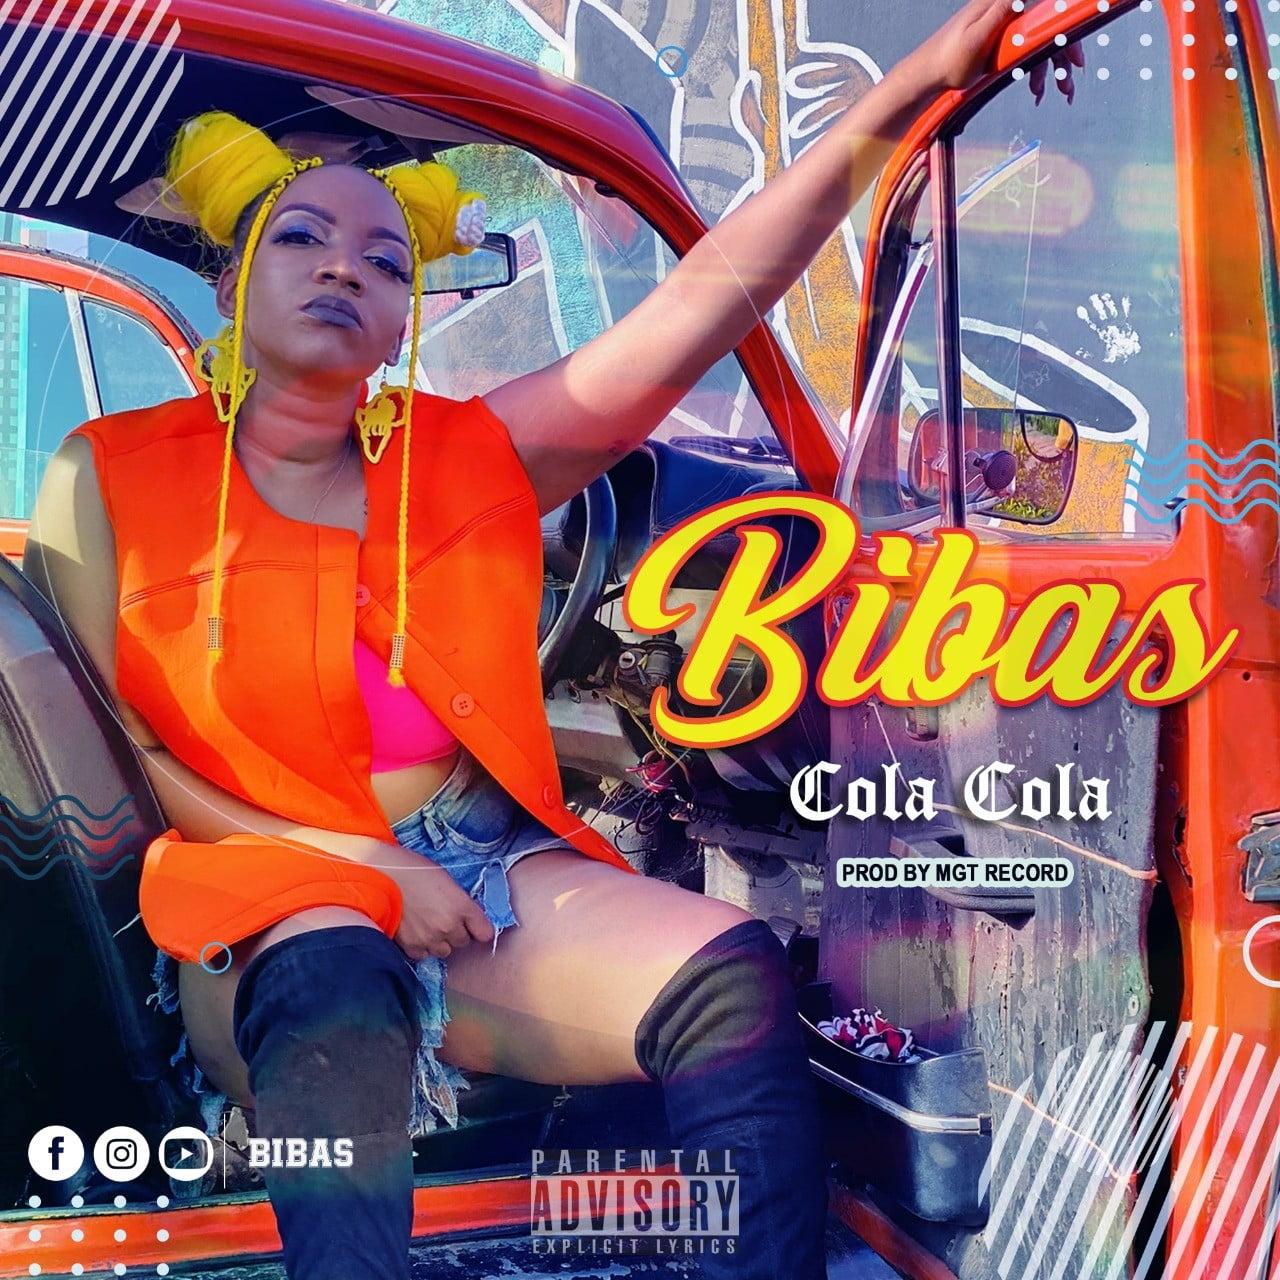 Bibas - Cola Cola (Prod. MGT Record)